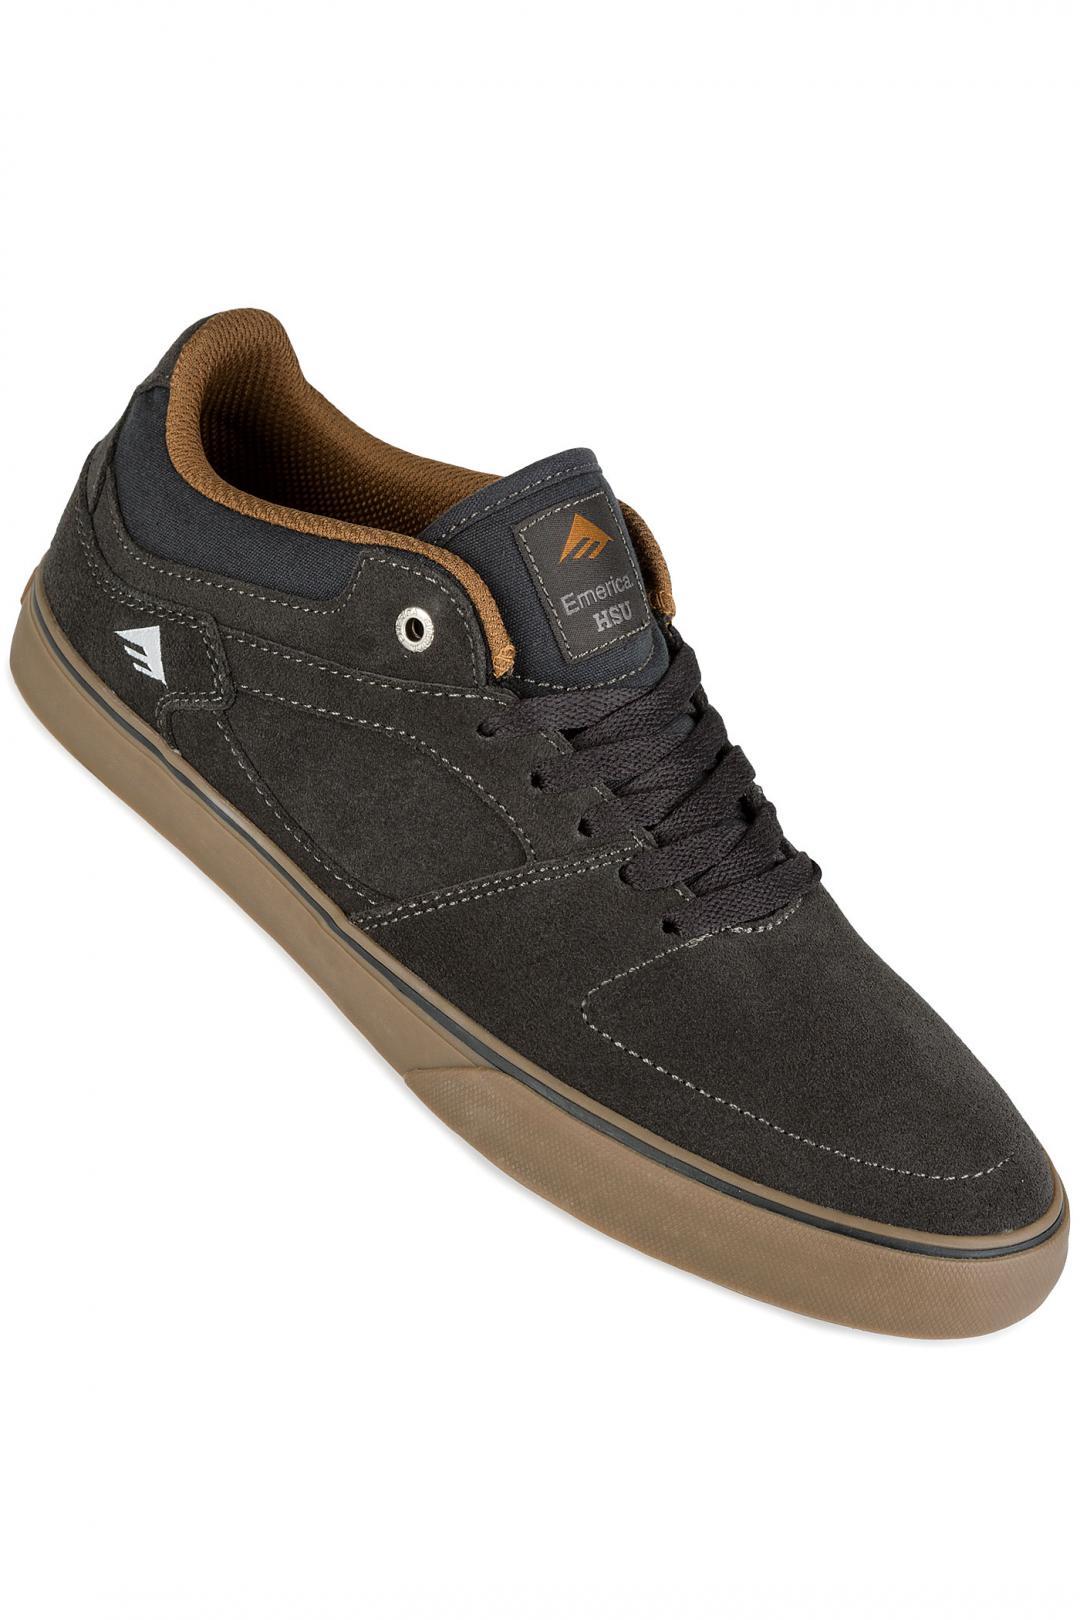 Uomo Emerica The HSU Low Vulc dark grey   Sneaker